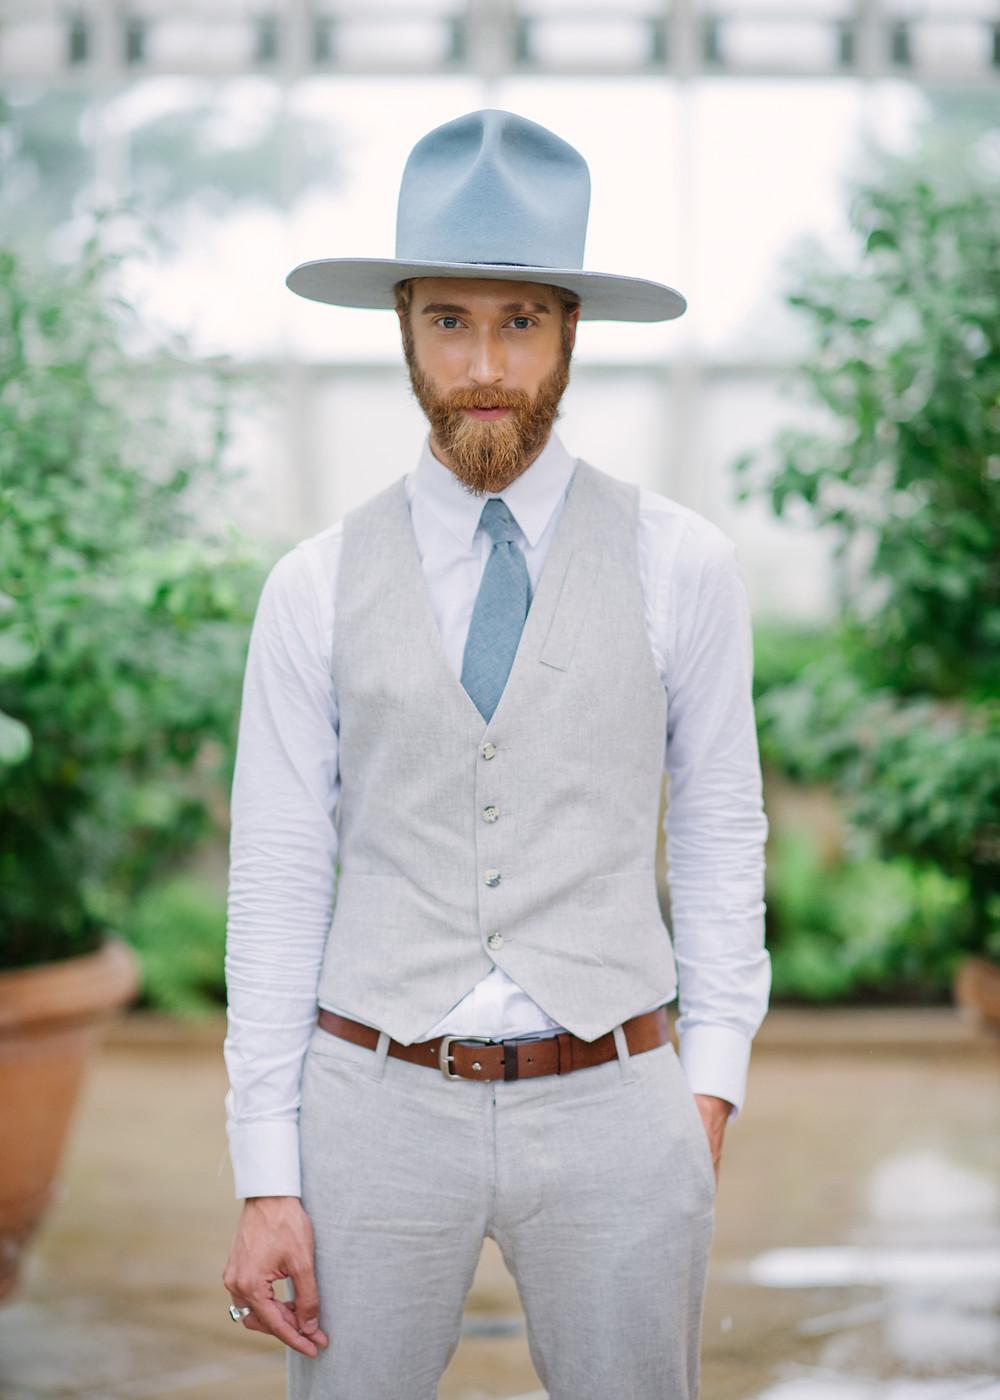 Wedding-suit-18-waits